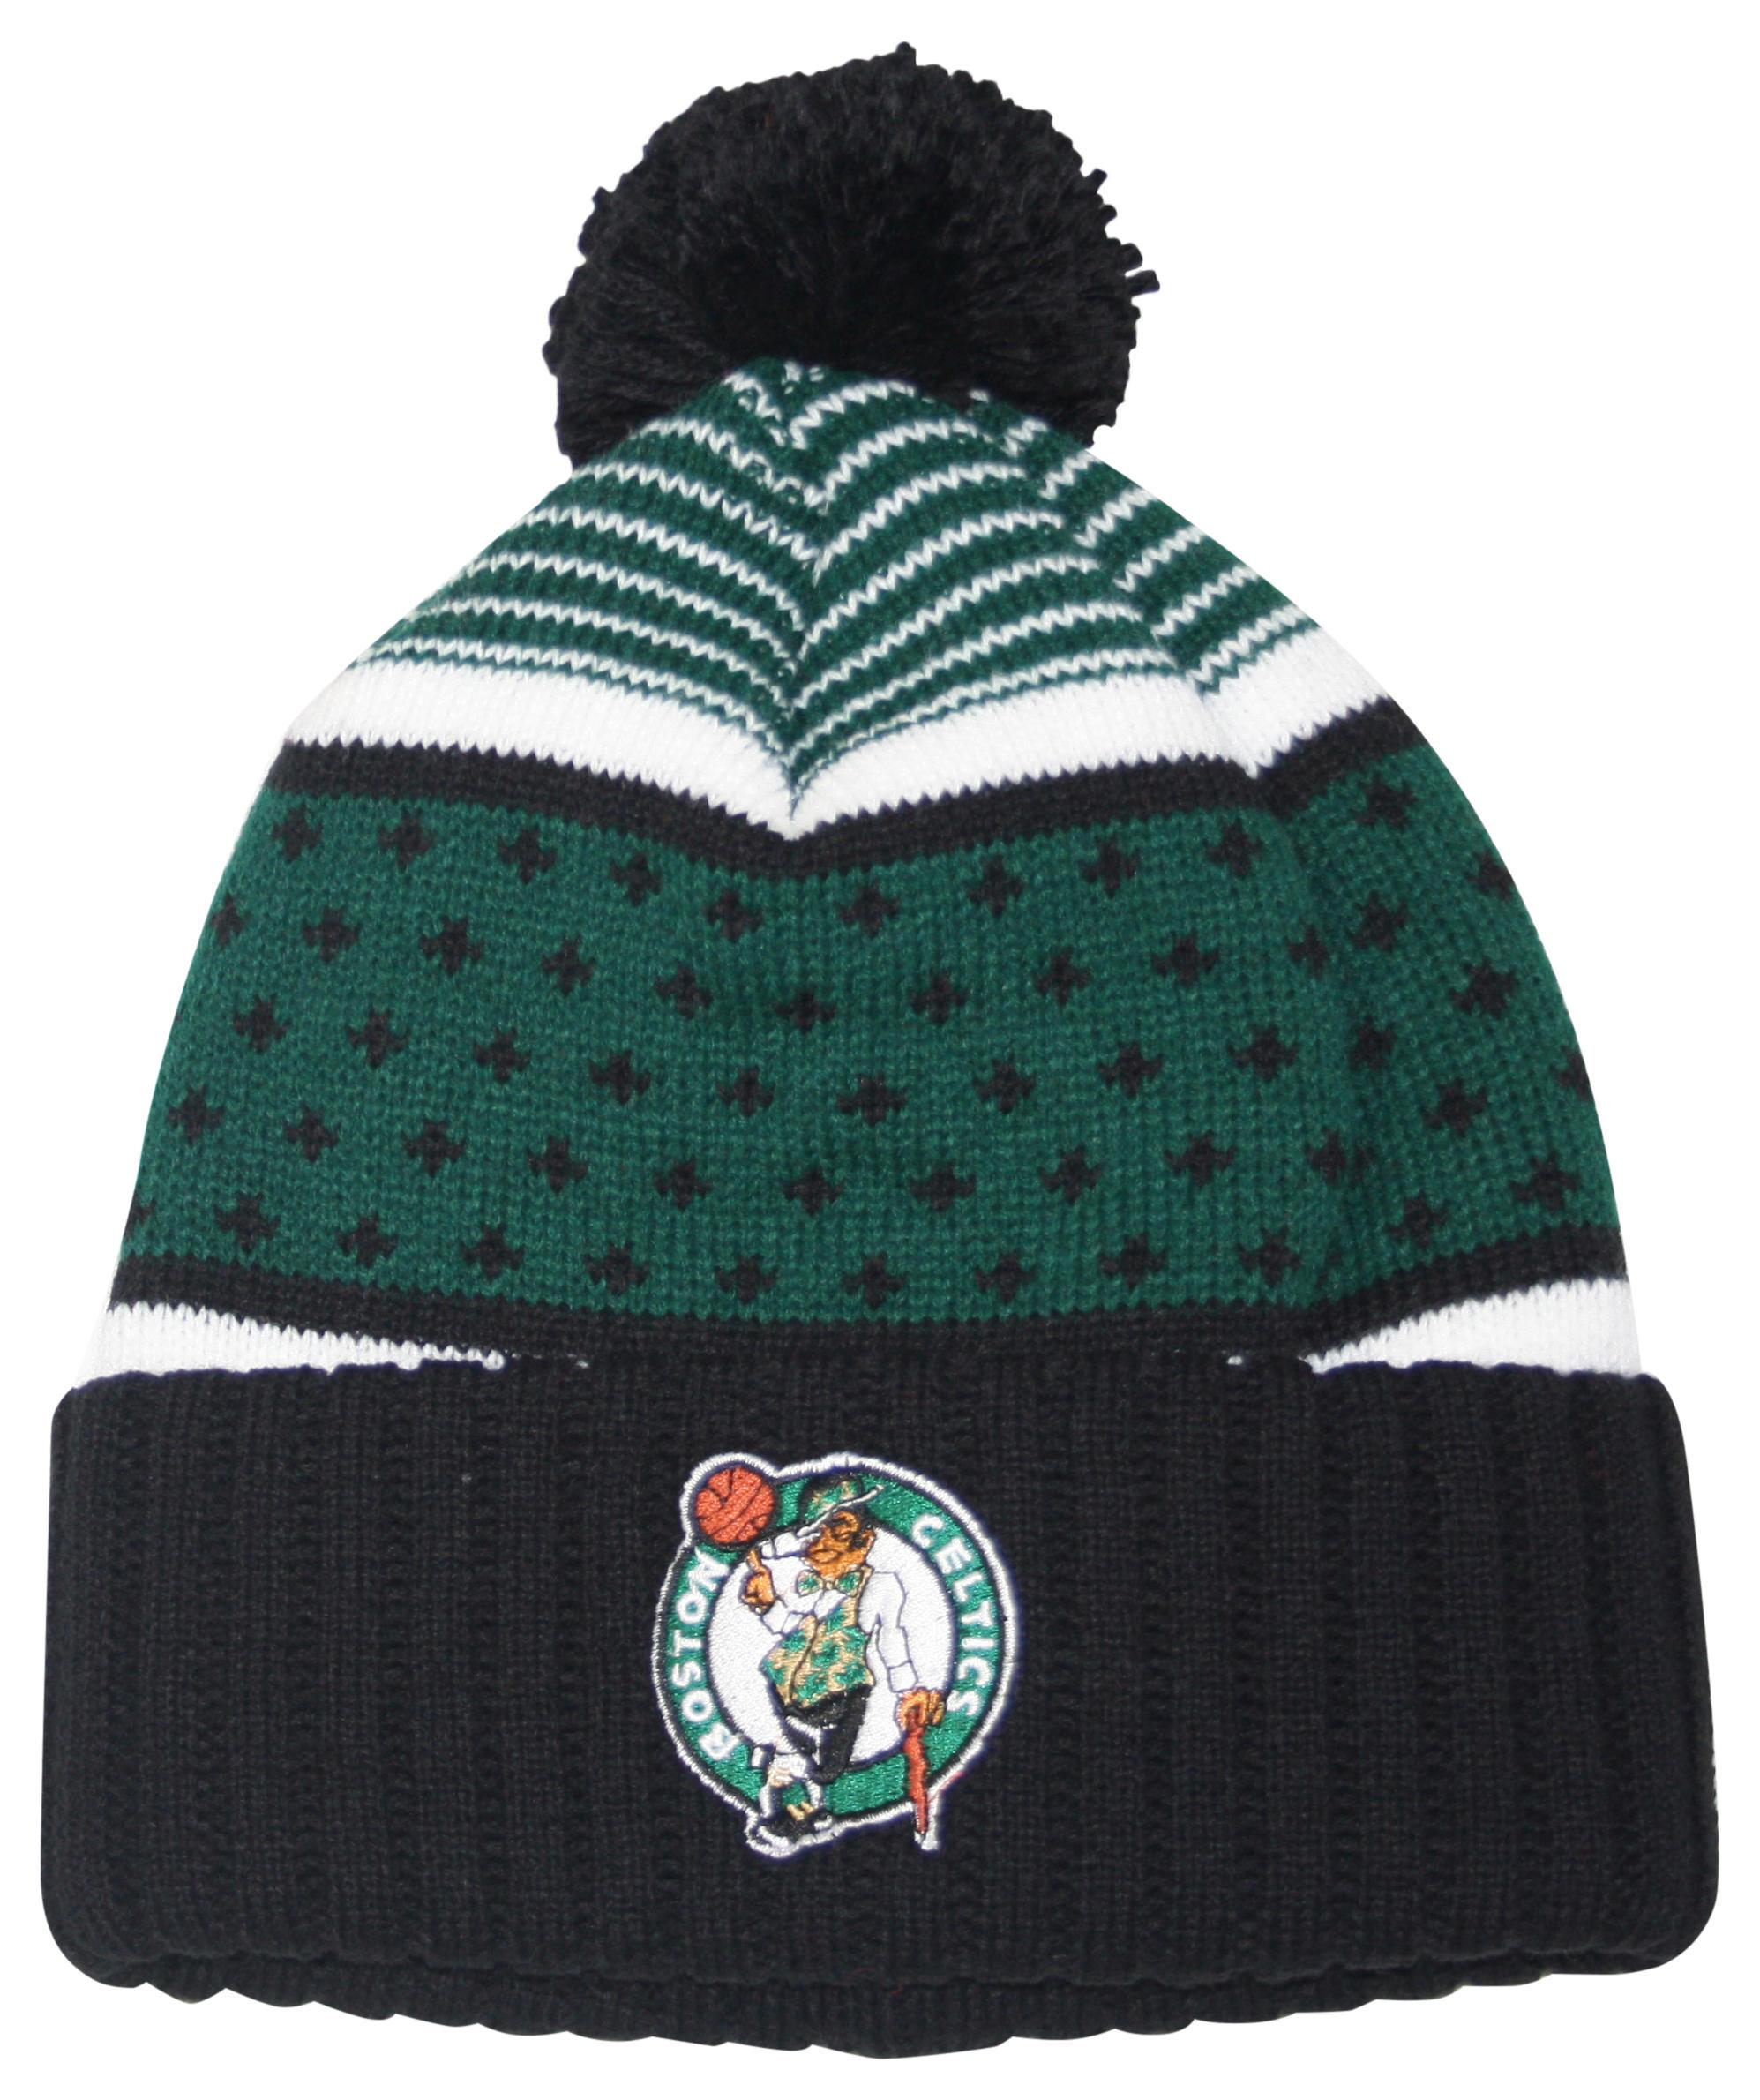 The Highlands Cuffed Pom Beanie Boston Celtics 1ebba2877506